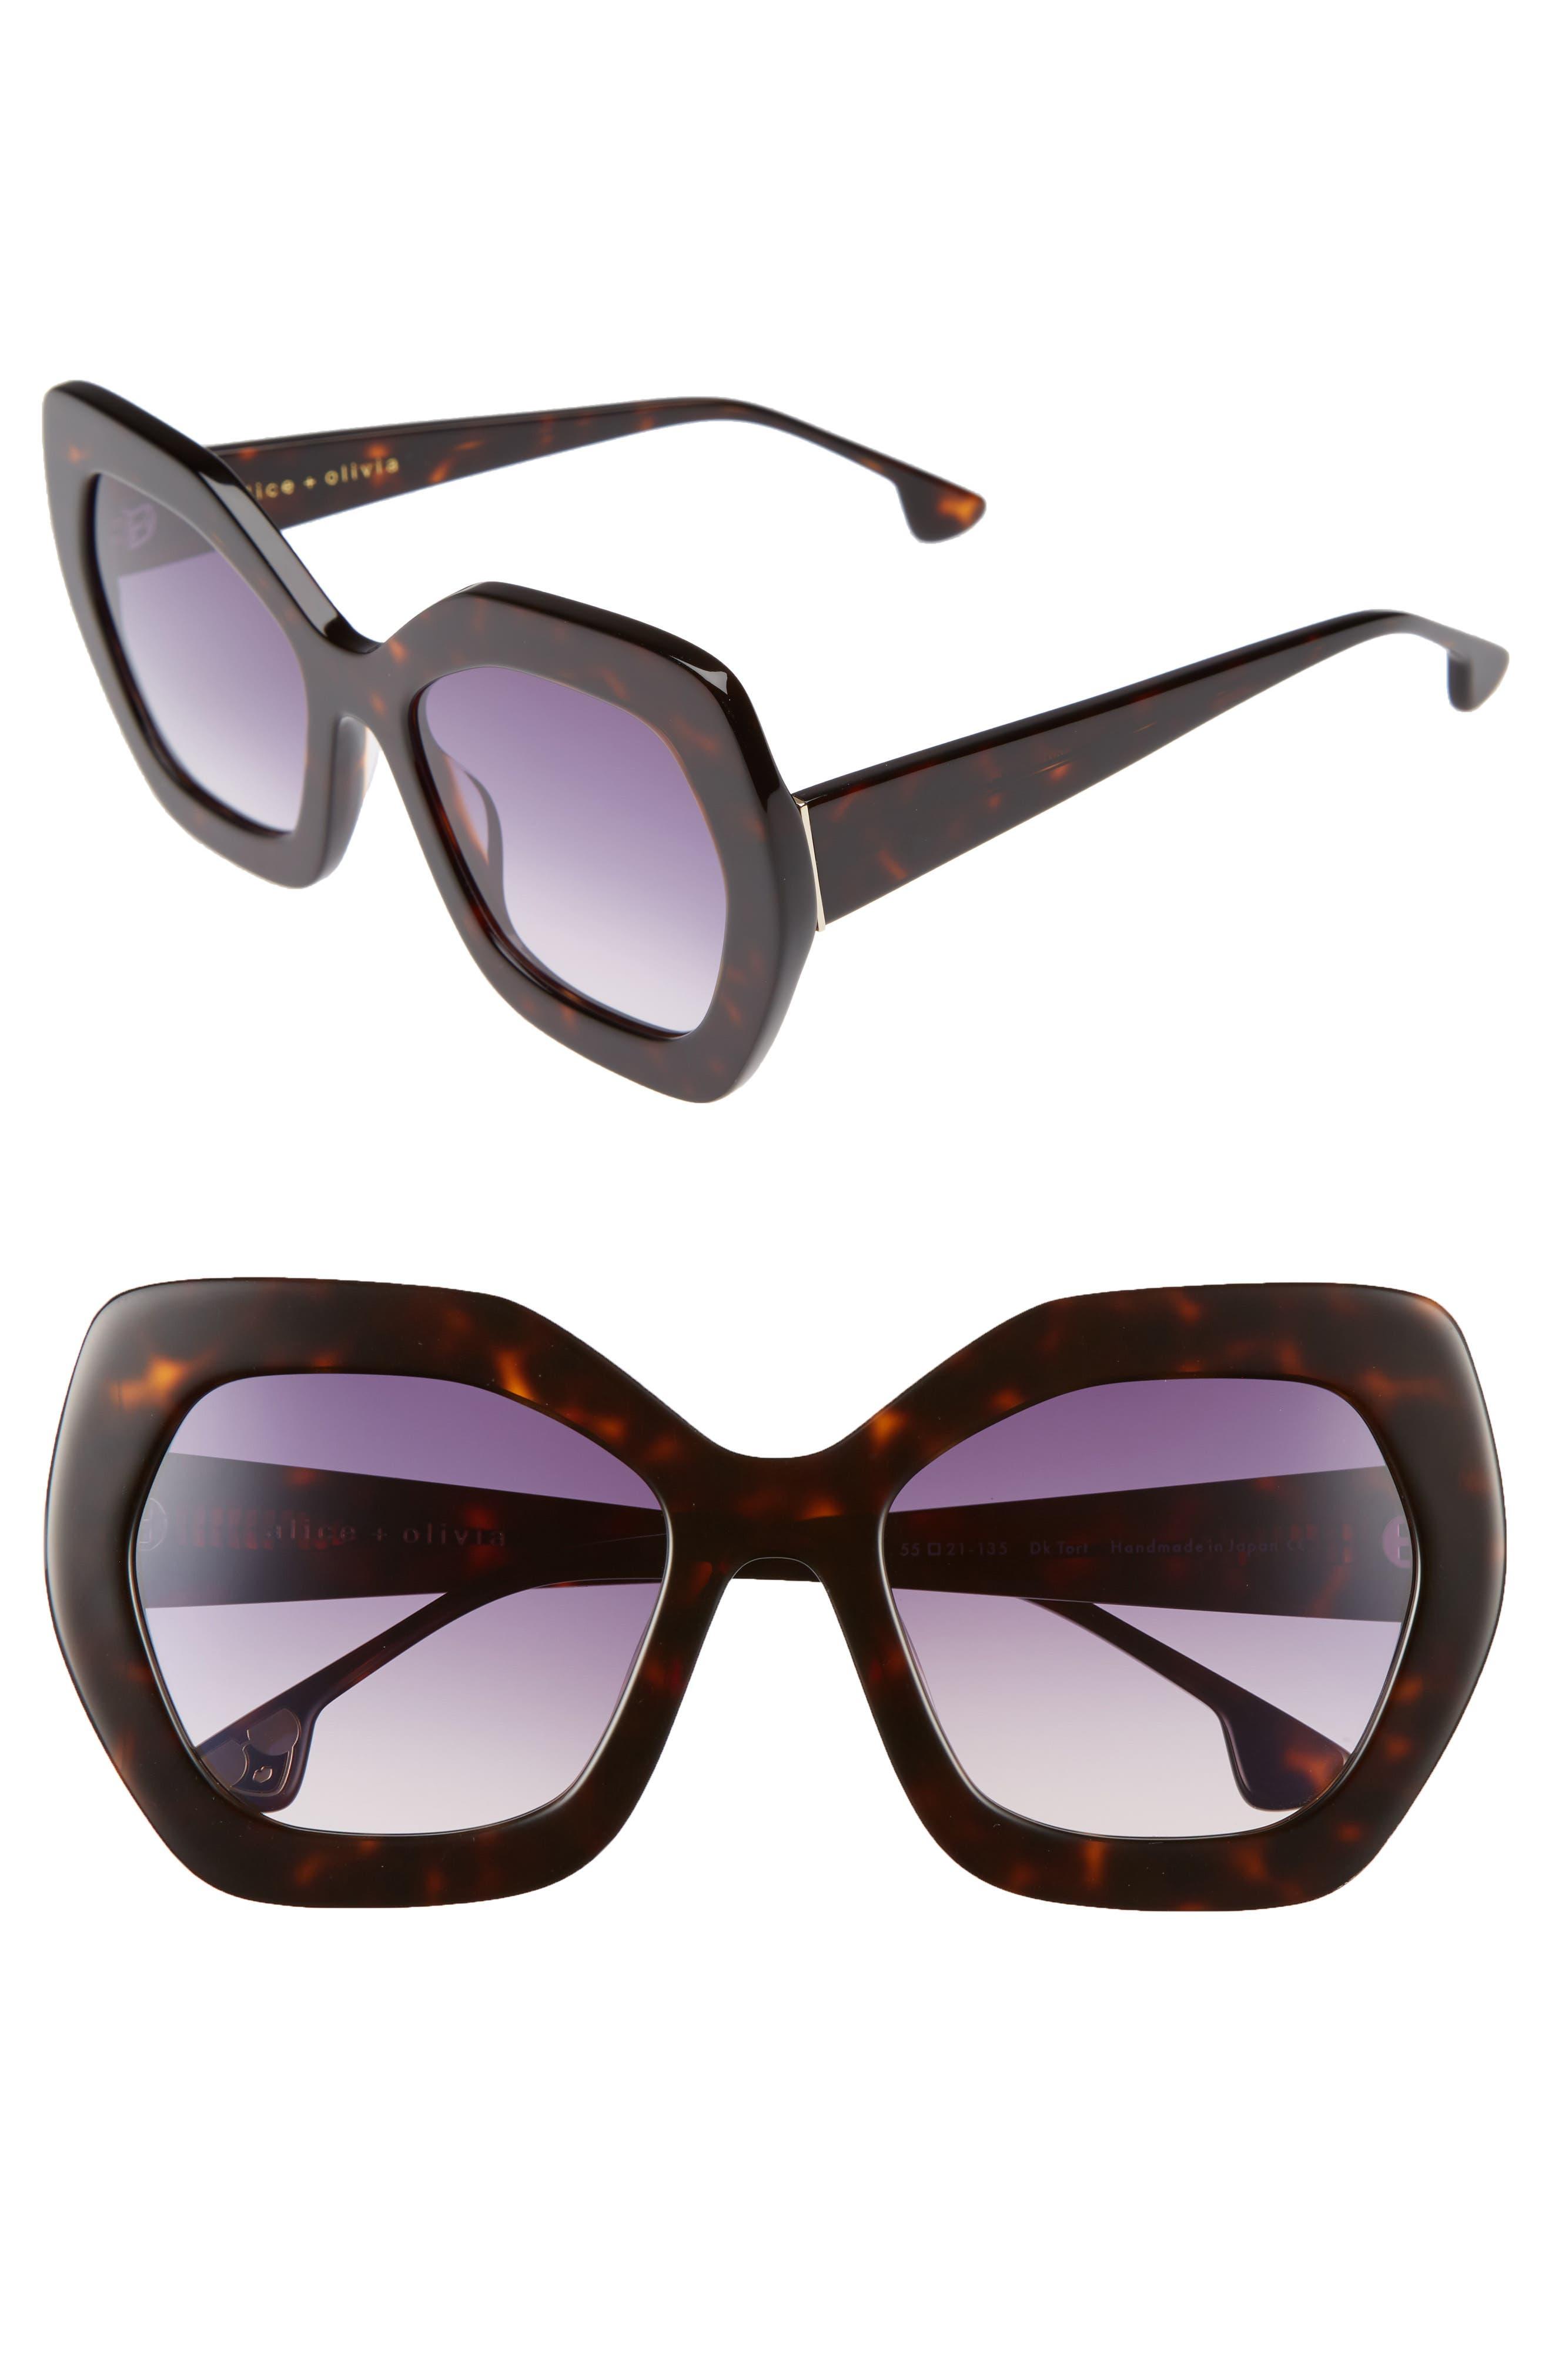 Dinah 55mm Butterfly Sunglasses,                             Main thumbnail 1, color,                             Dark Tortoise